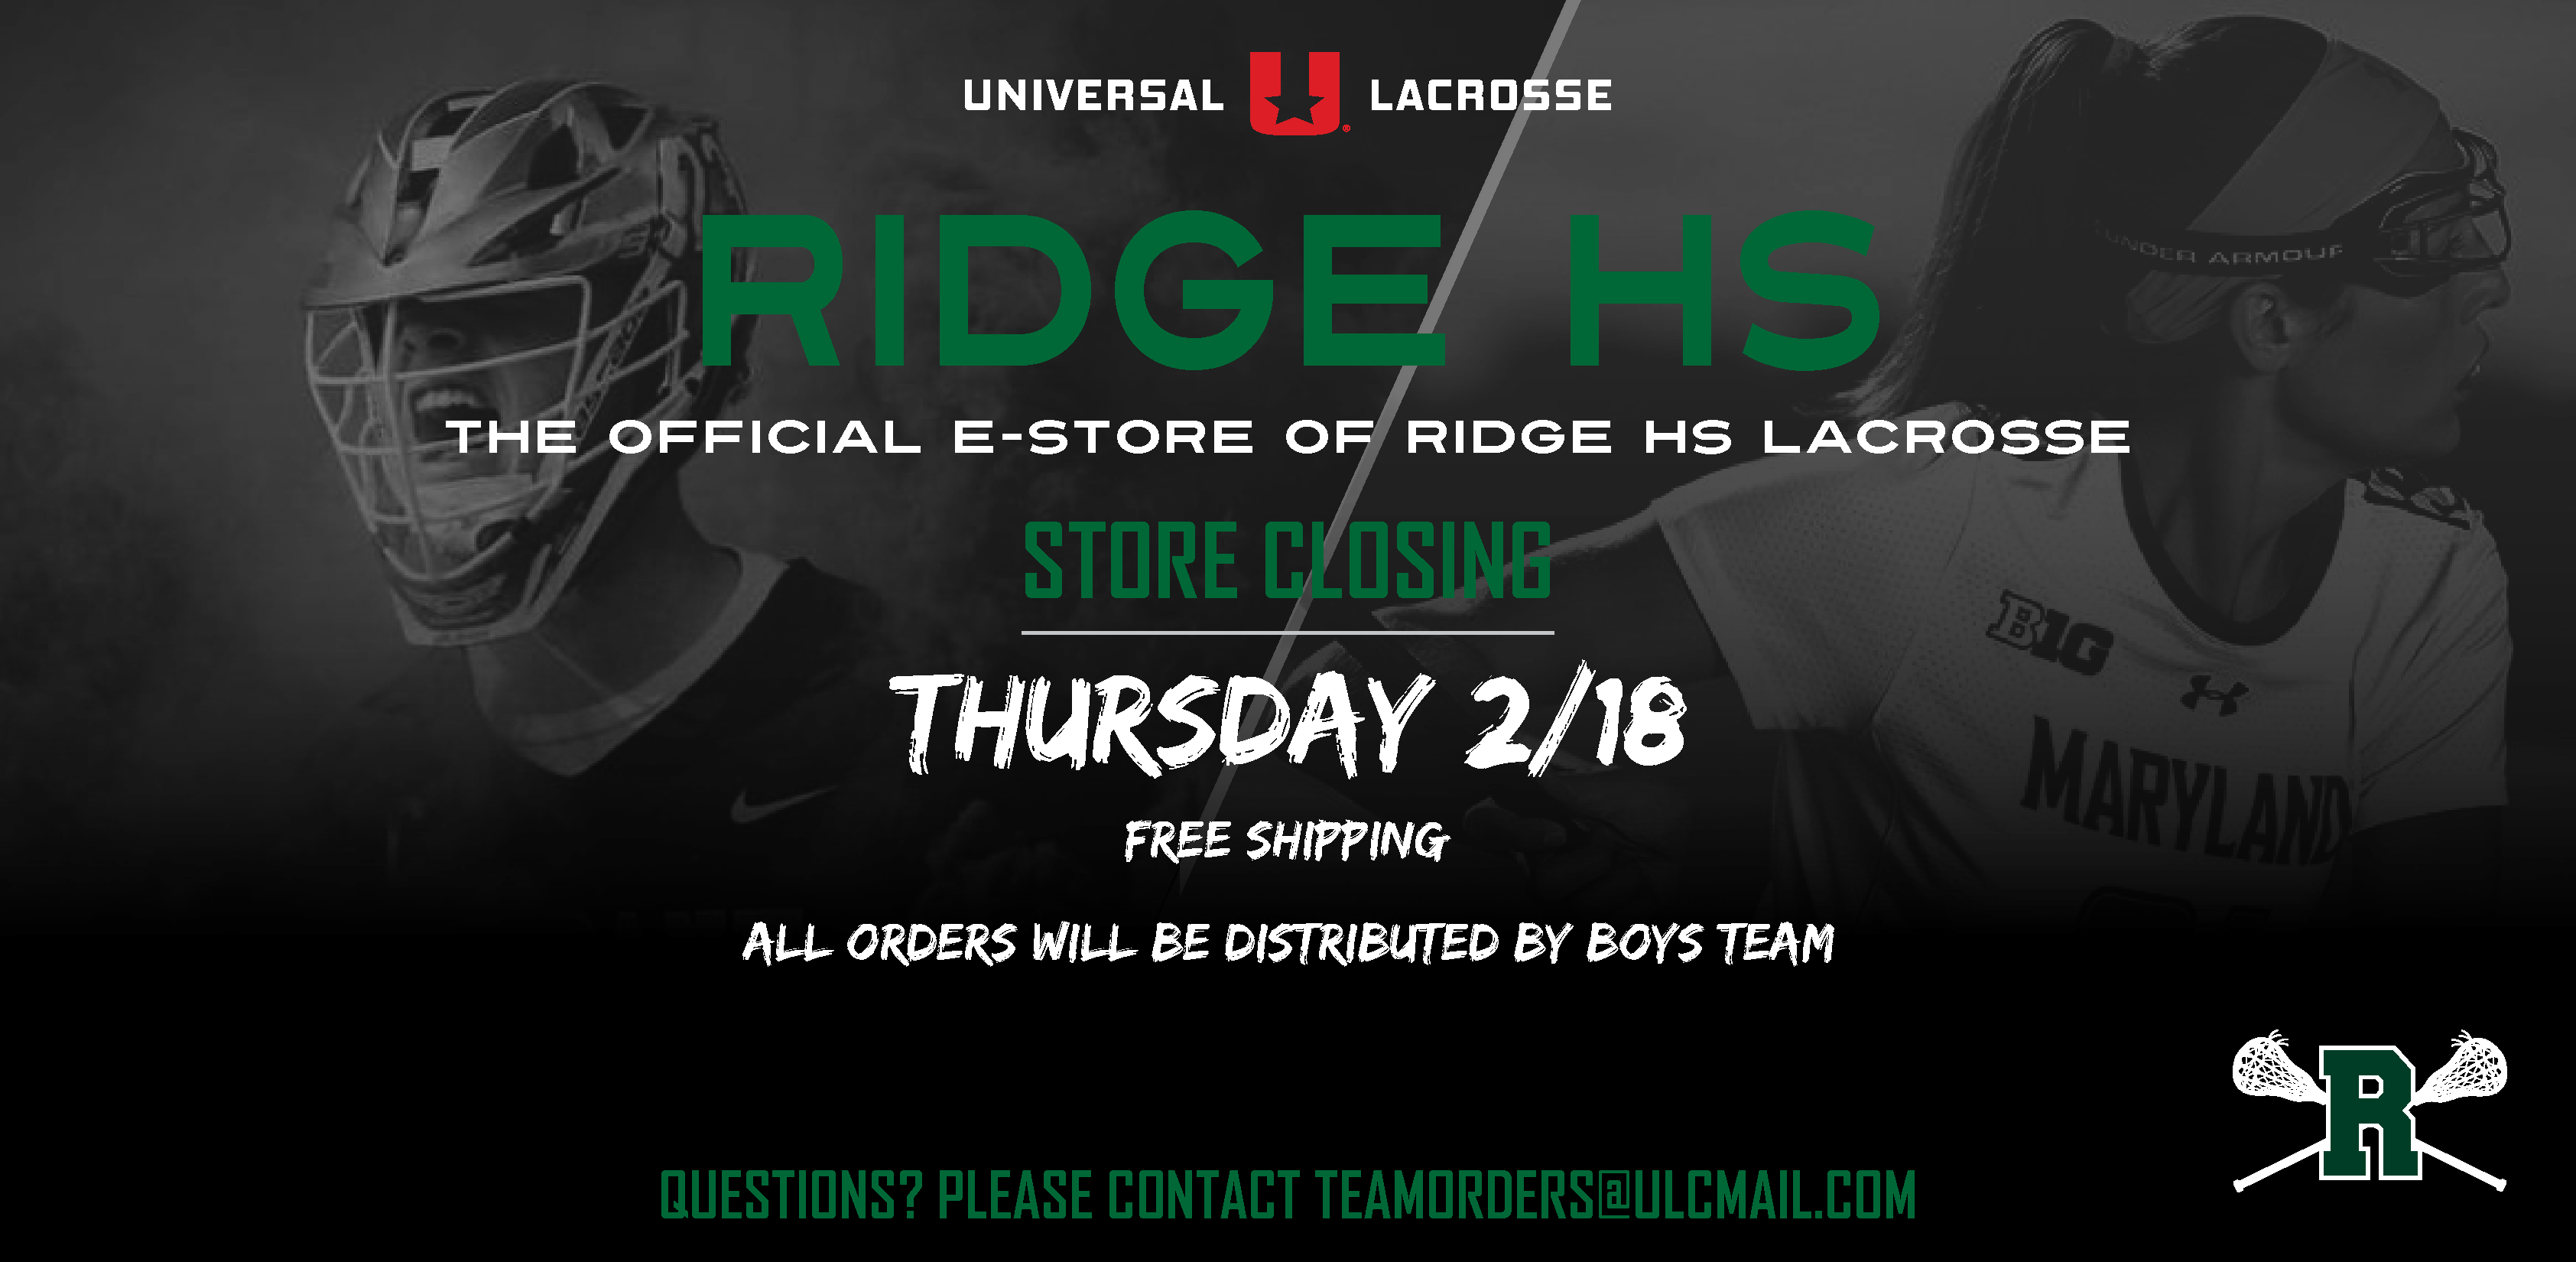 Ridge HS Lacrosse